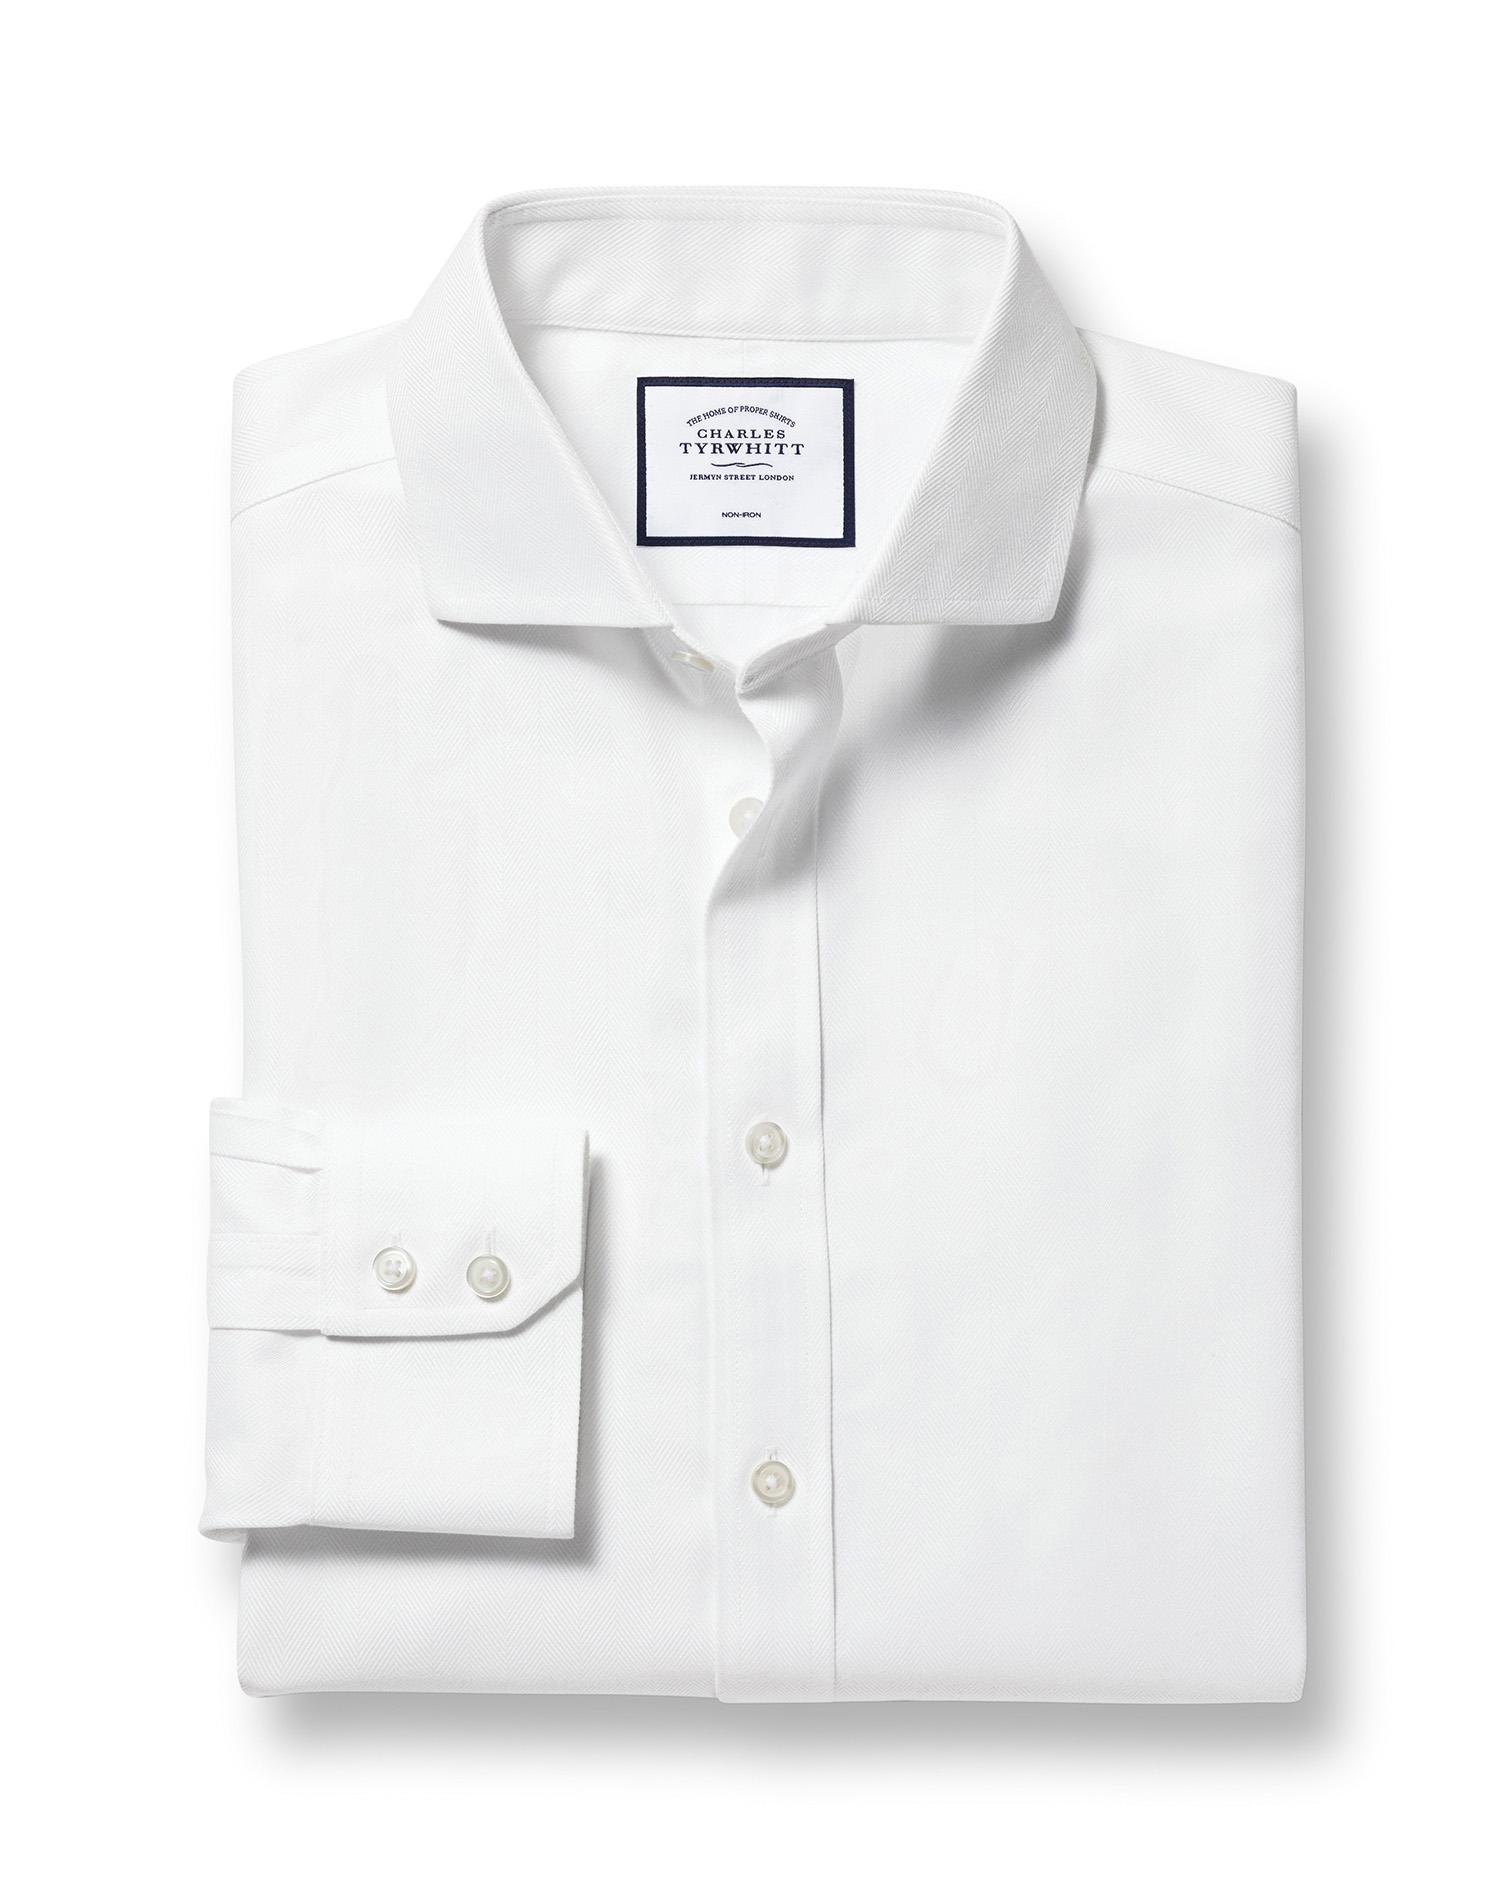 Extra Slim Fit Cutaway Non-Iron Herringbone White Cotton Formal Shirt Single Cuff Size 16.5/38 by Ch